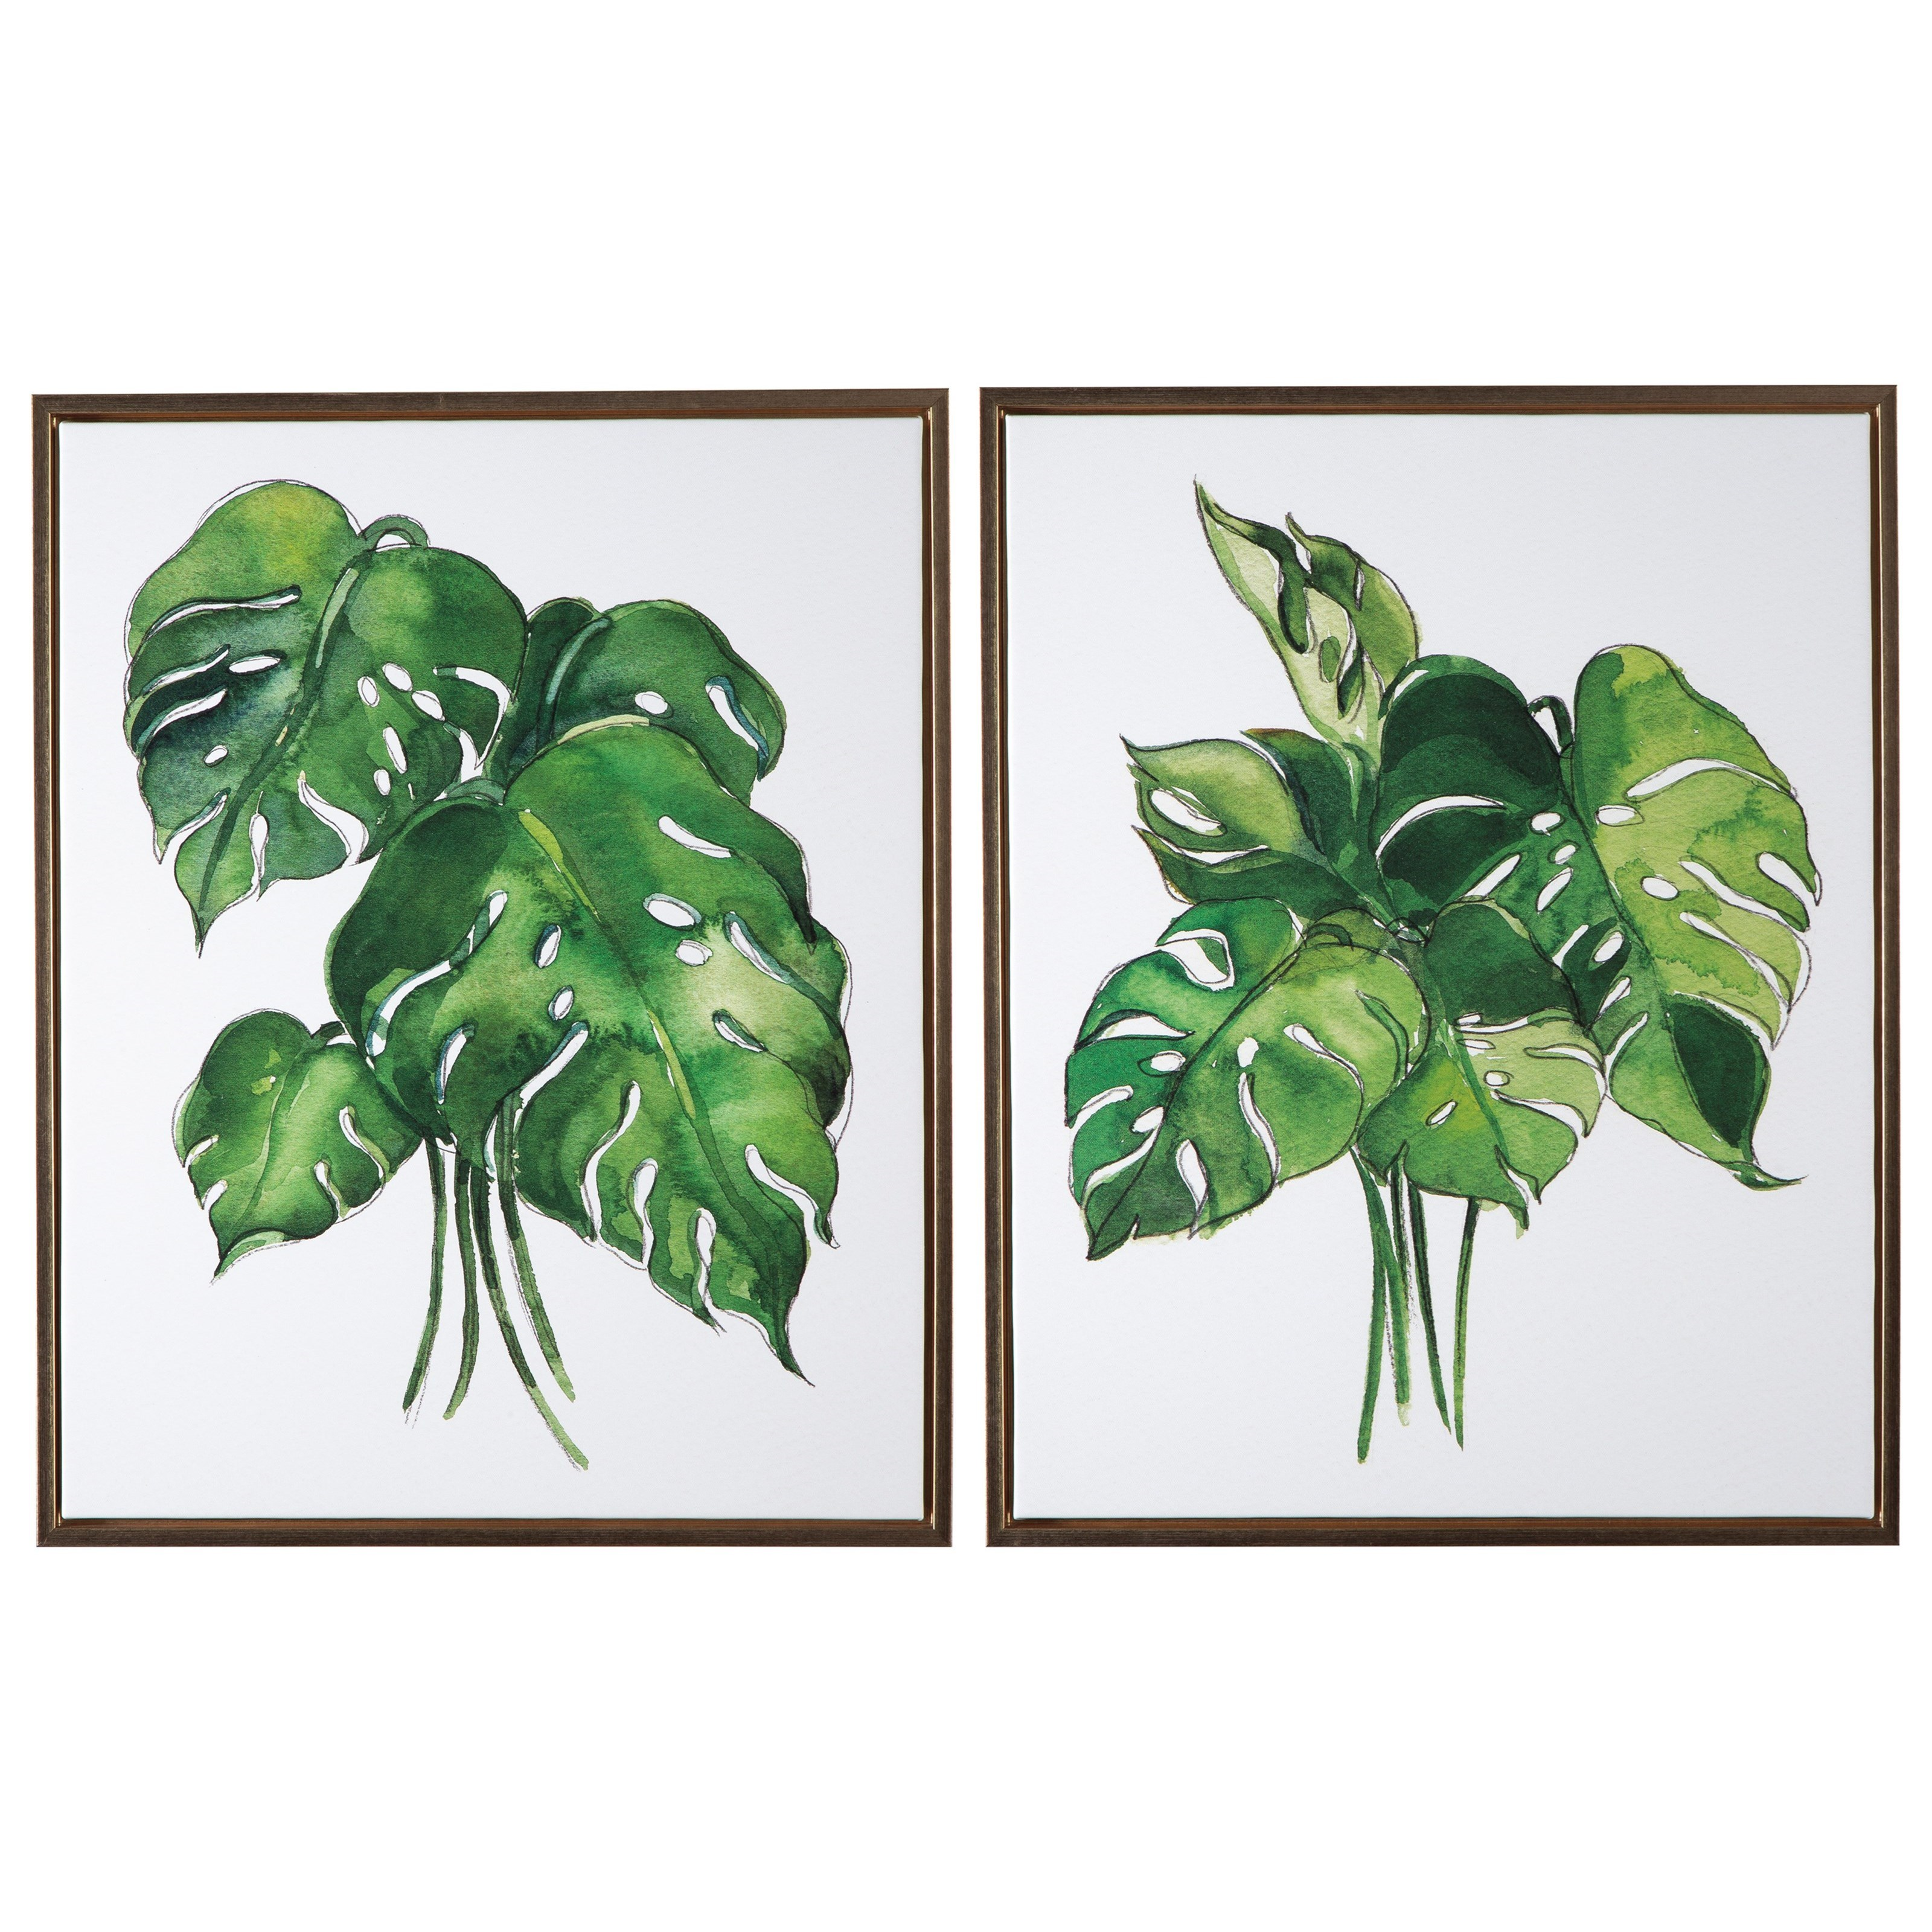 Wall Art Jakayla Green/White Wall Art Set by Signature Design by Ashley at Northeast Factory Direct